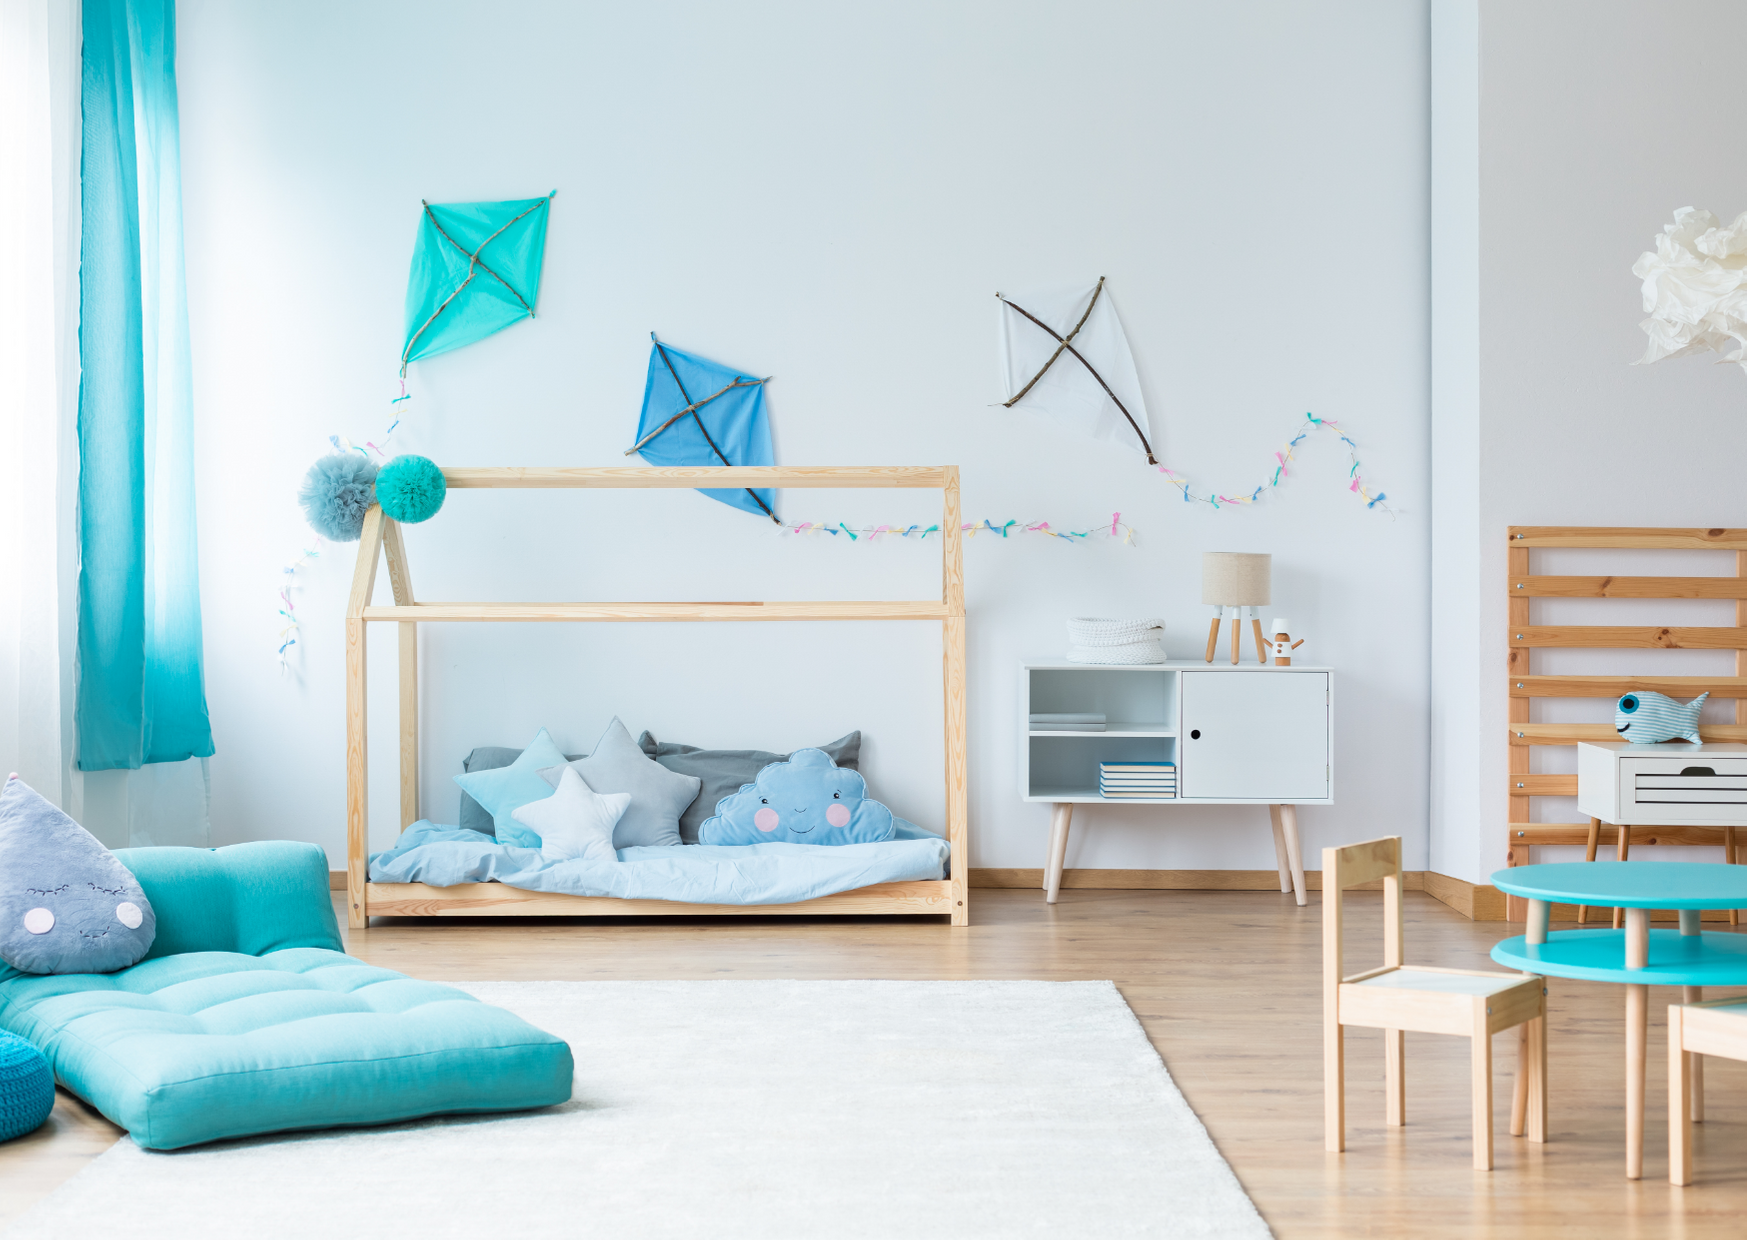 Wood in childrens bedrooms